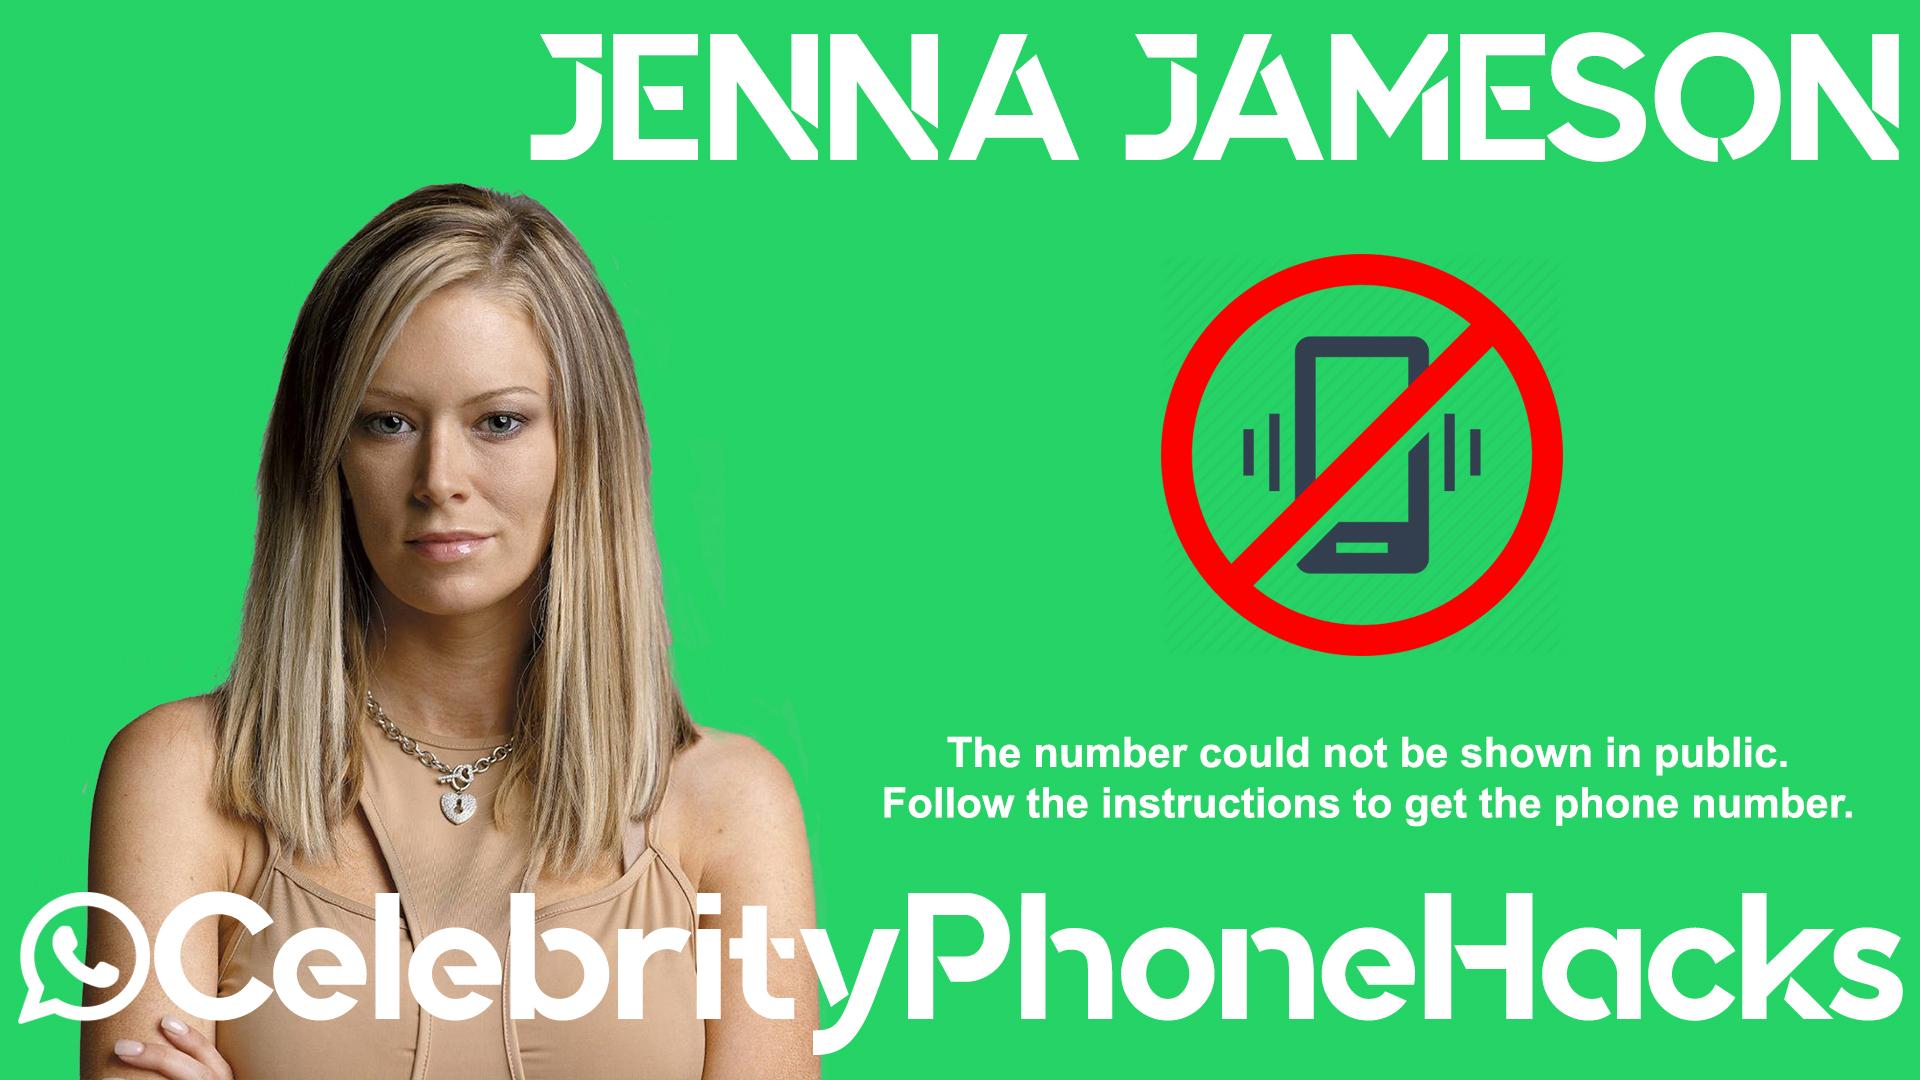 Jenna Jameson real phone number 2019 whatsapp hacked leaked